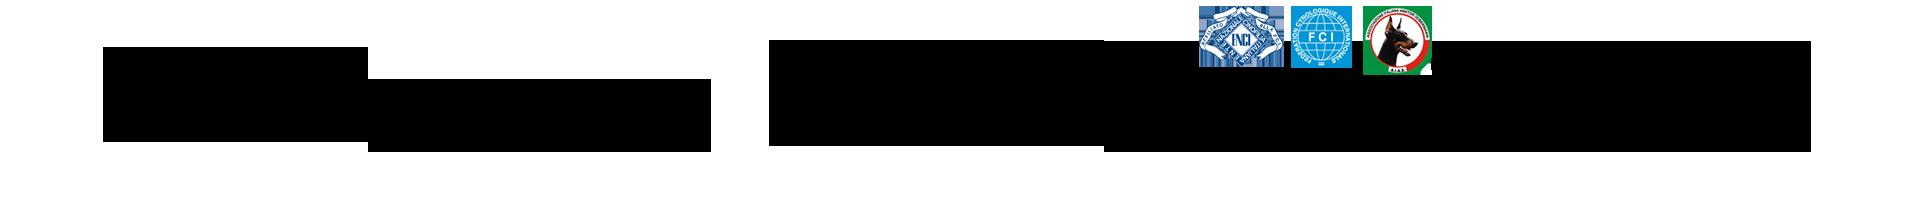 Dobermann del Munt Marin